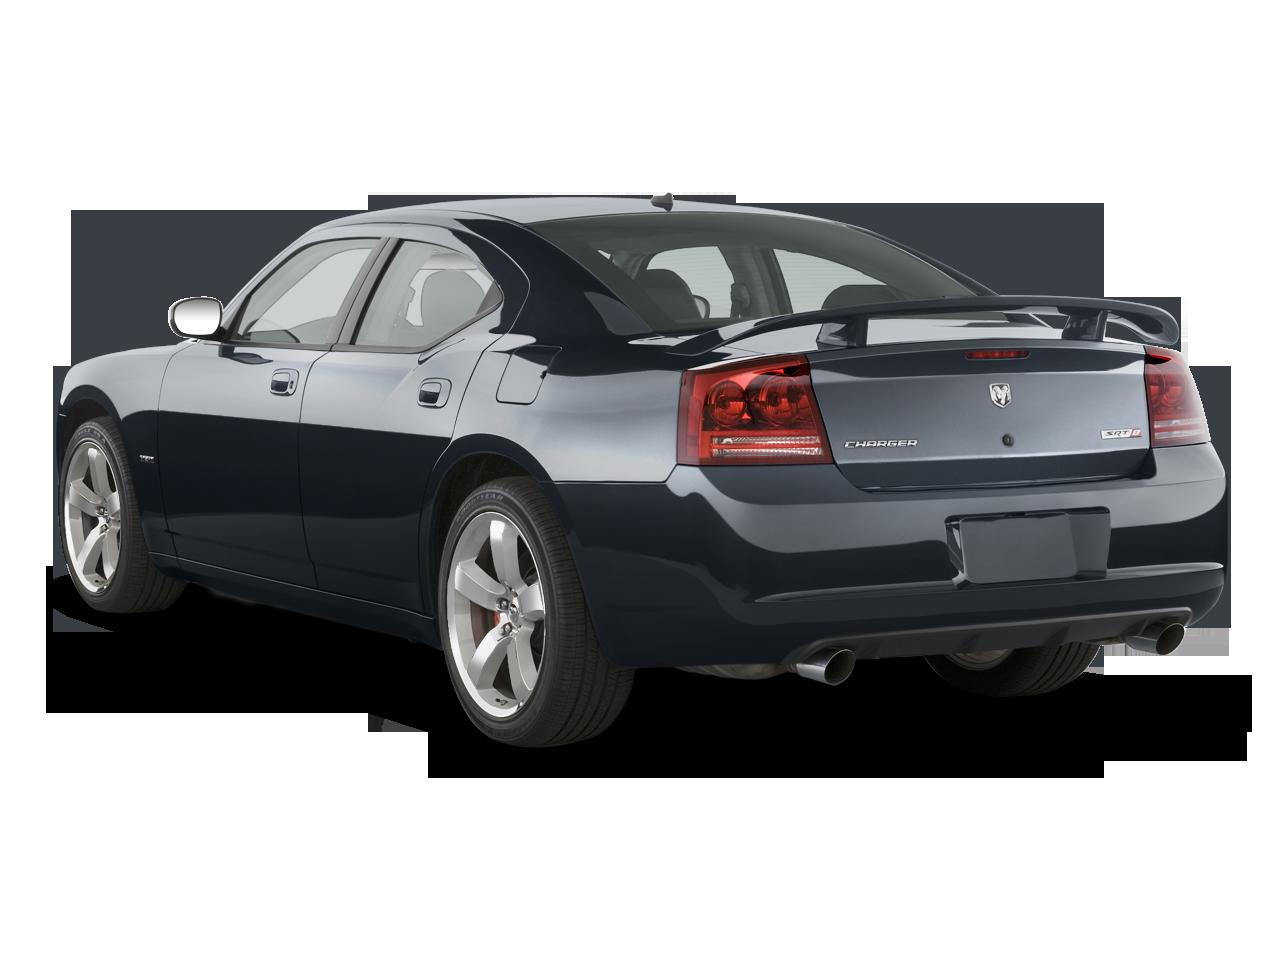 2010 dodge charger srt8 dodge sports coupe review automobile - Dodge Charger 2010 Srt8